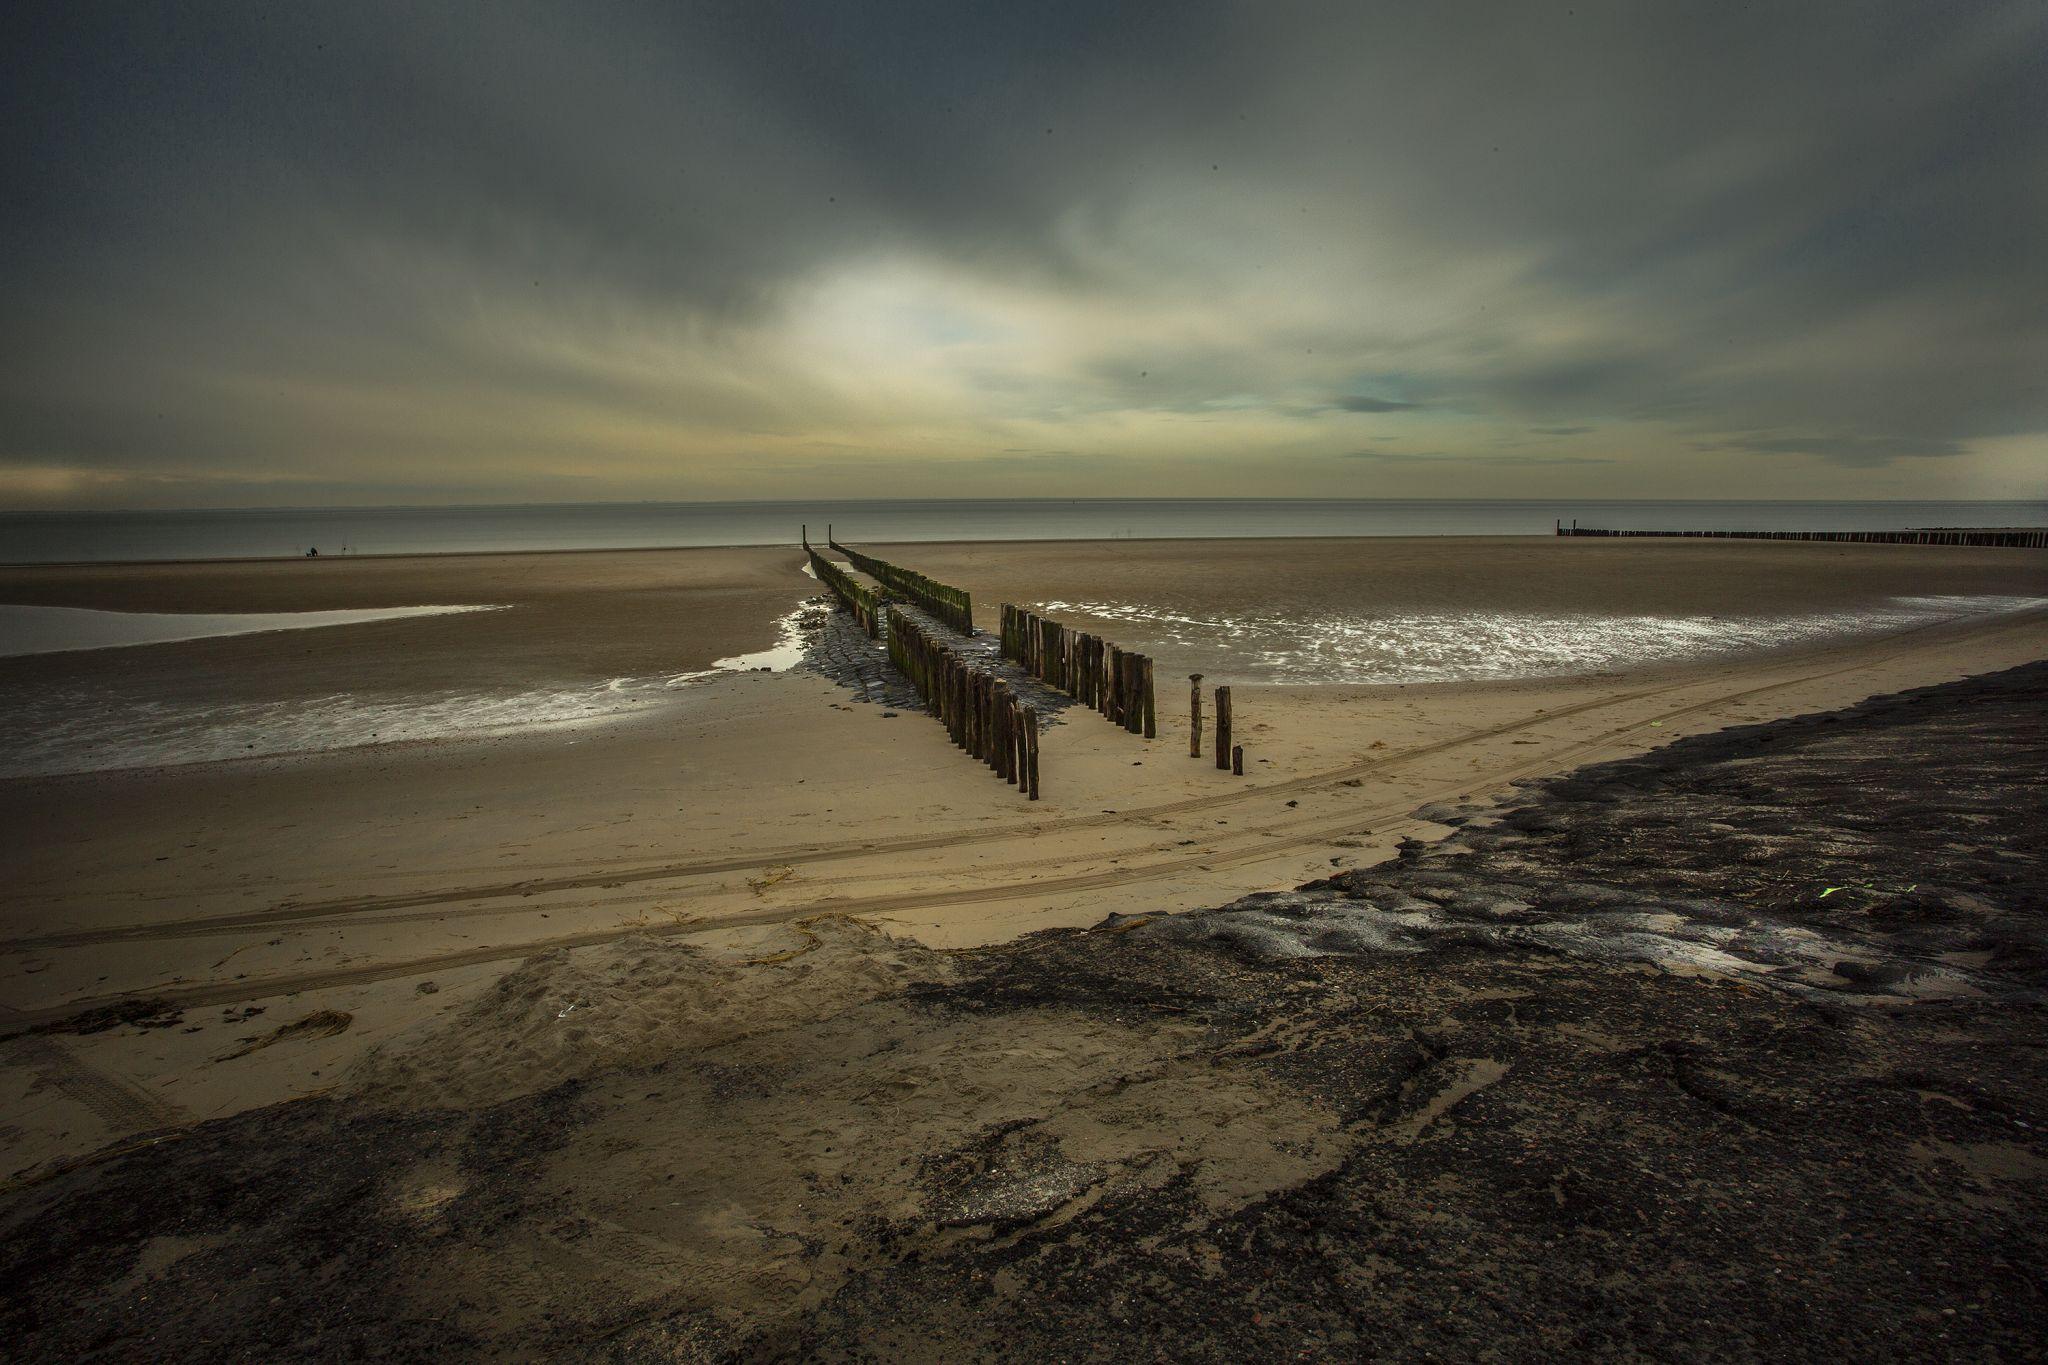 Zoutelande Beach, Netherlands